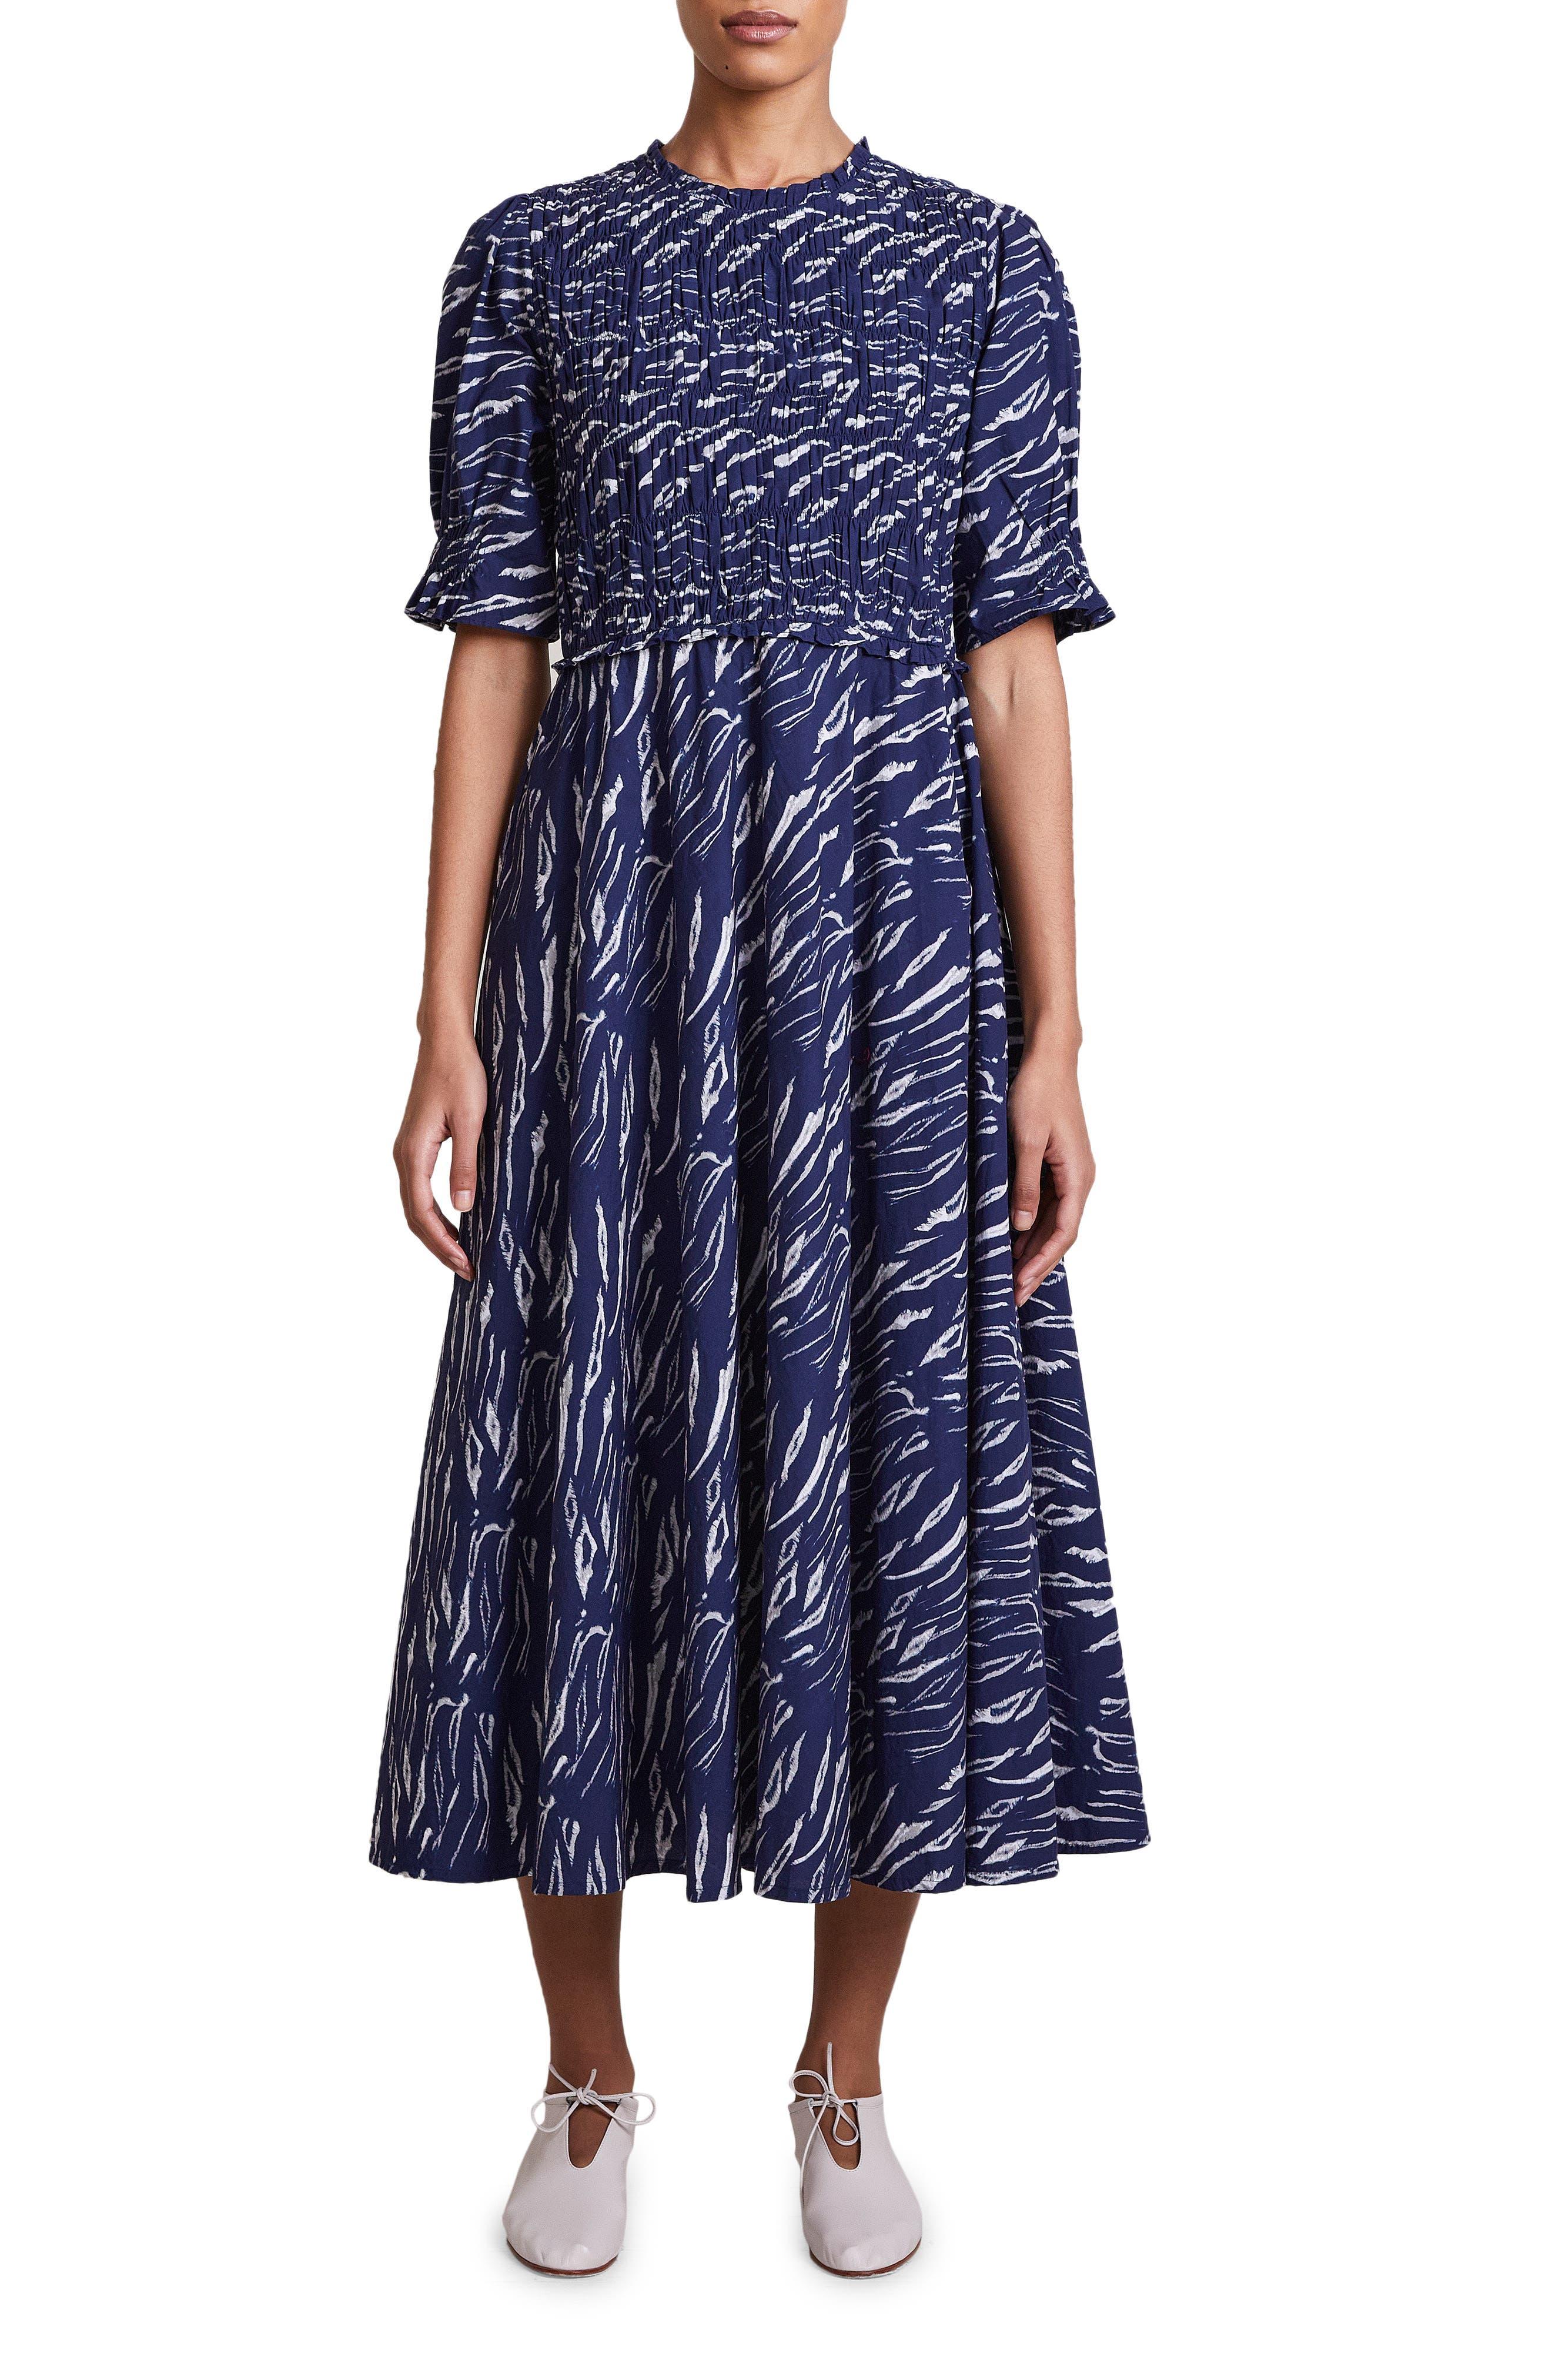 Piedra Organic Cotton Dress